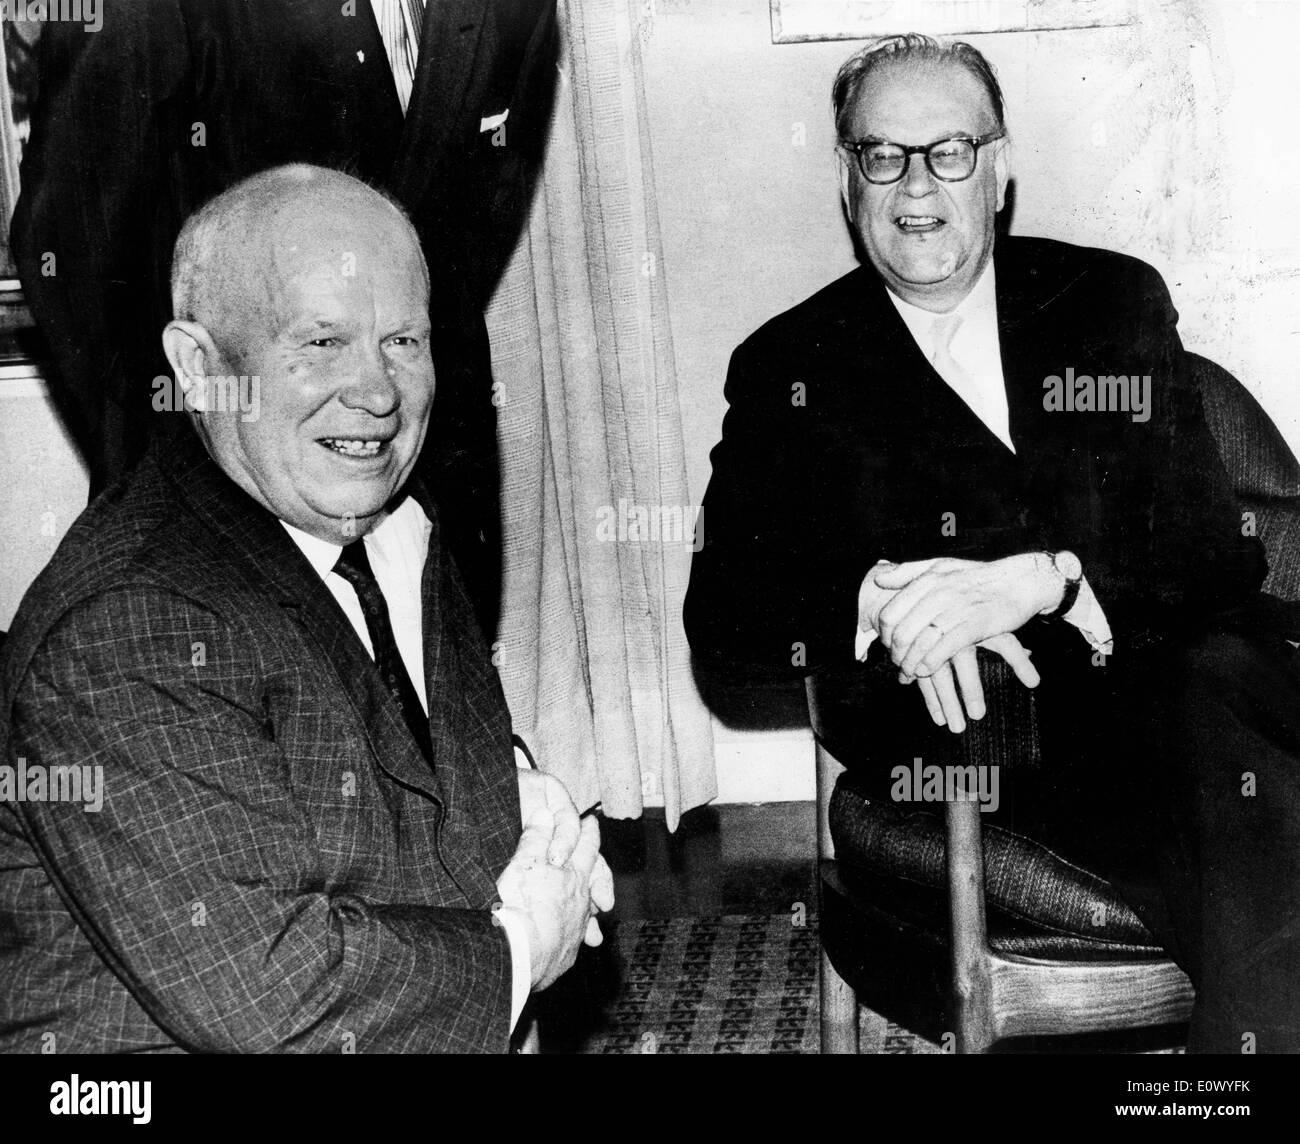 Nikita Khrushchev with Tage Erlander - Stock Image